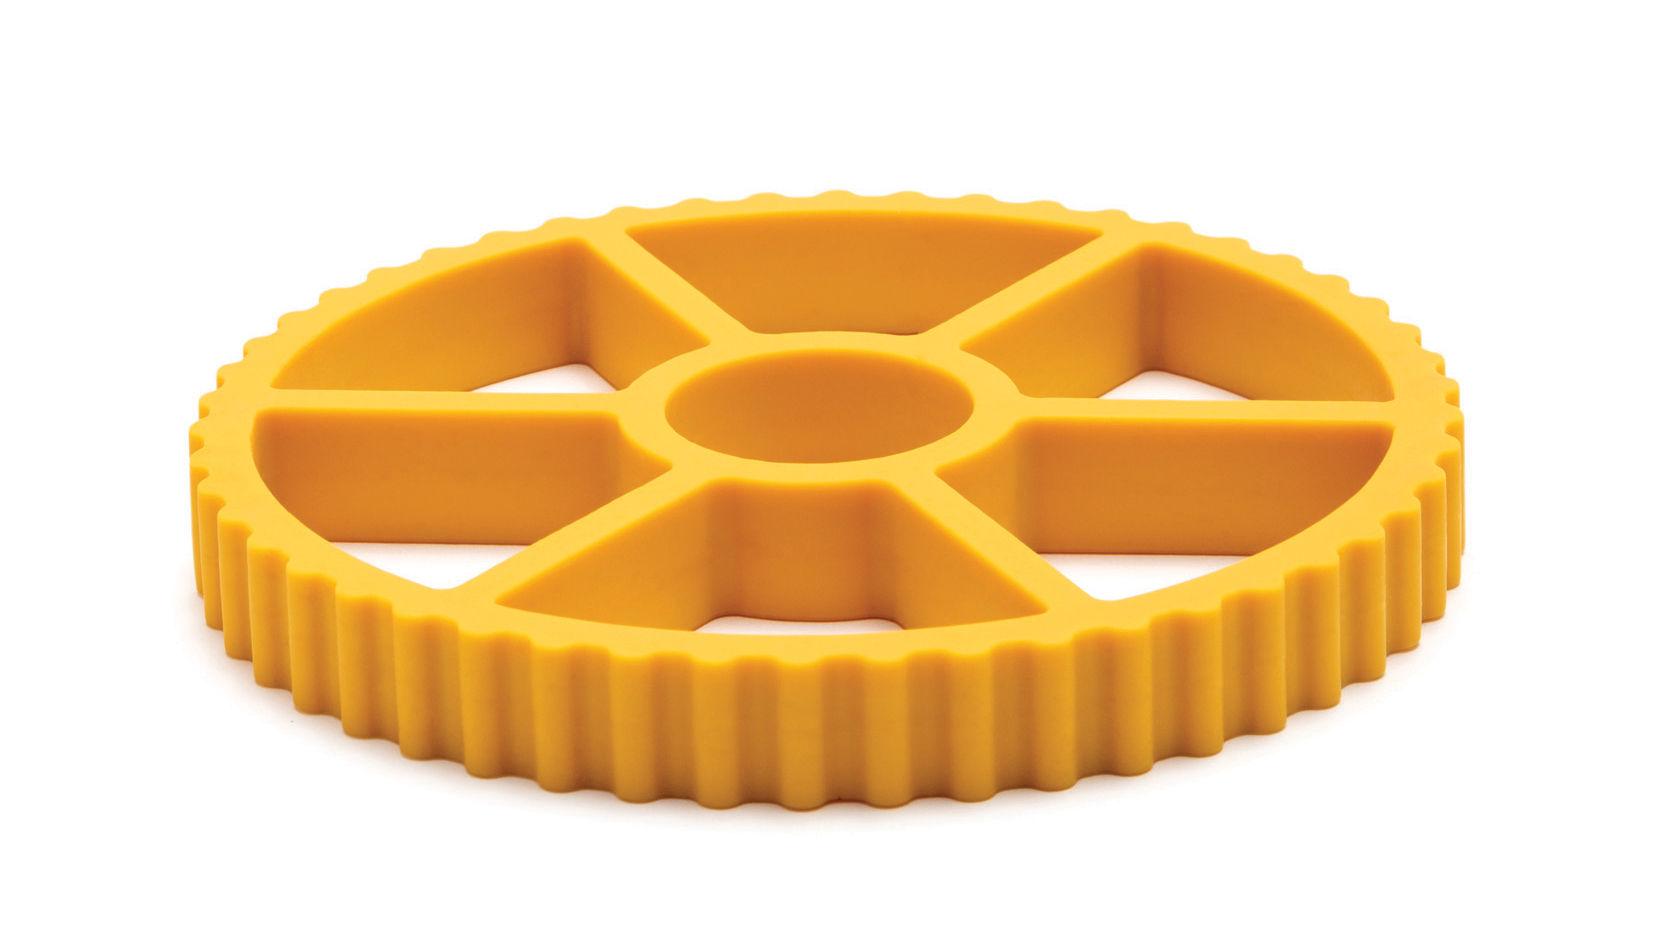 Tischkultur - Topfuntersetzer - Rotelle Topfuntersetzer / Silikon - Pa Design - Gelb - Silicone souple